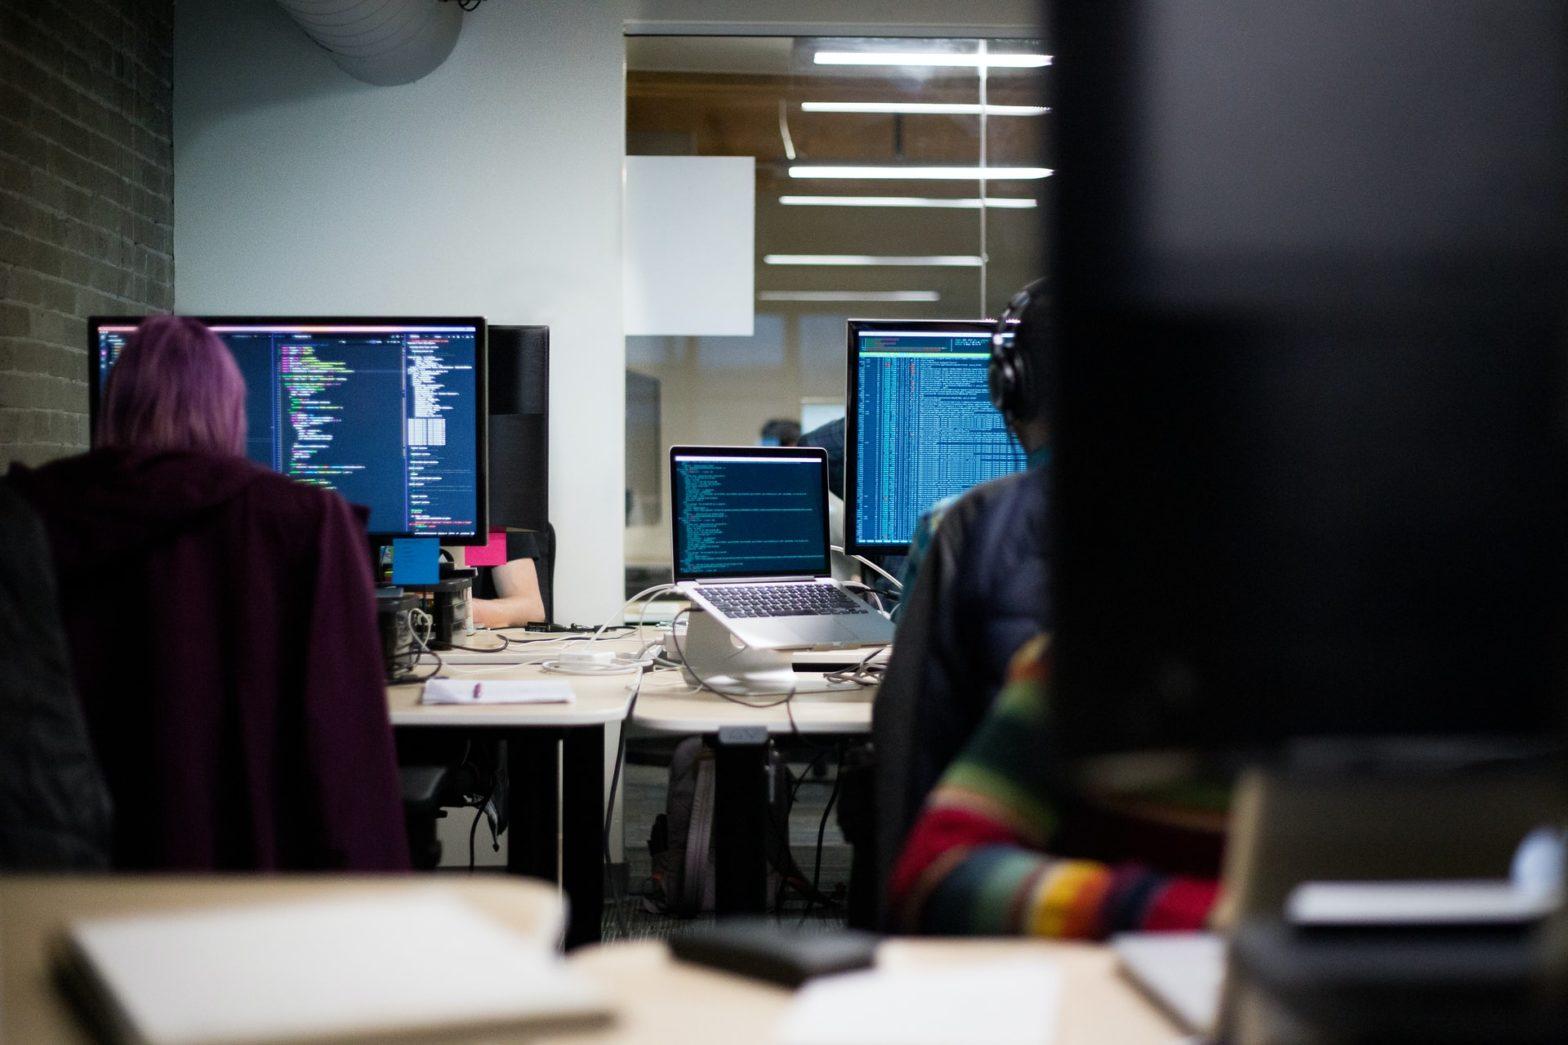 Software Engineer Apprenticeship in 2022